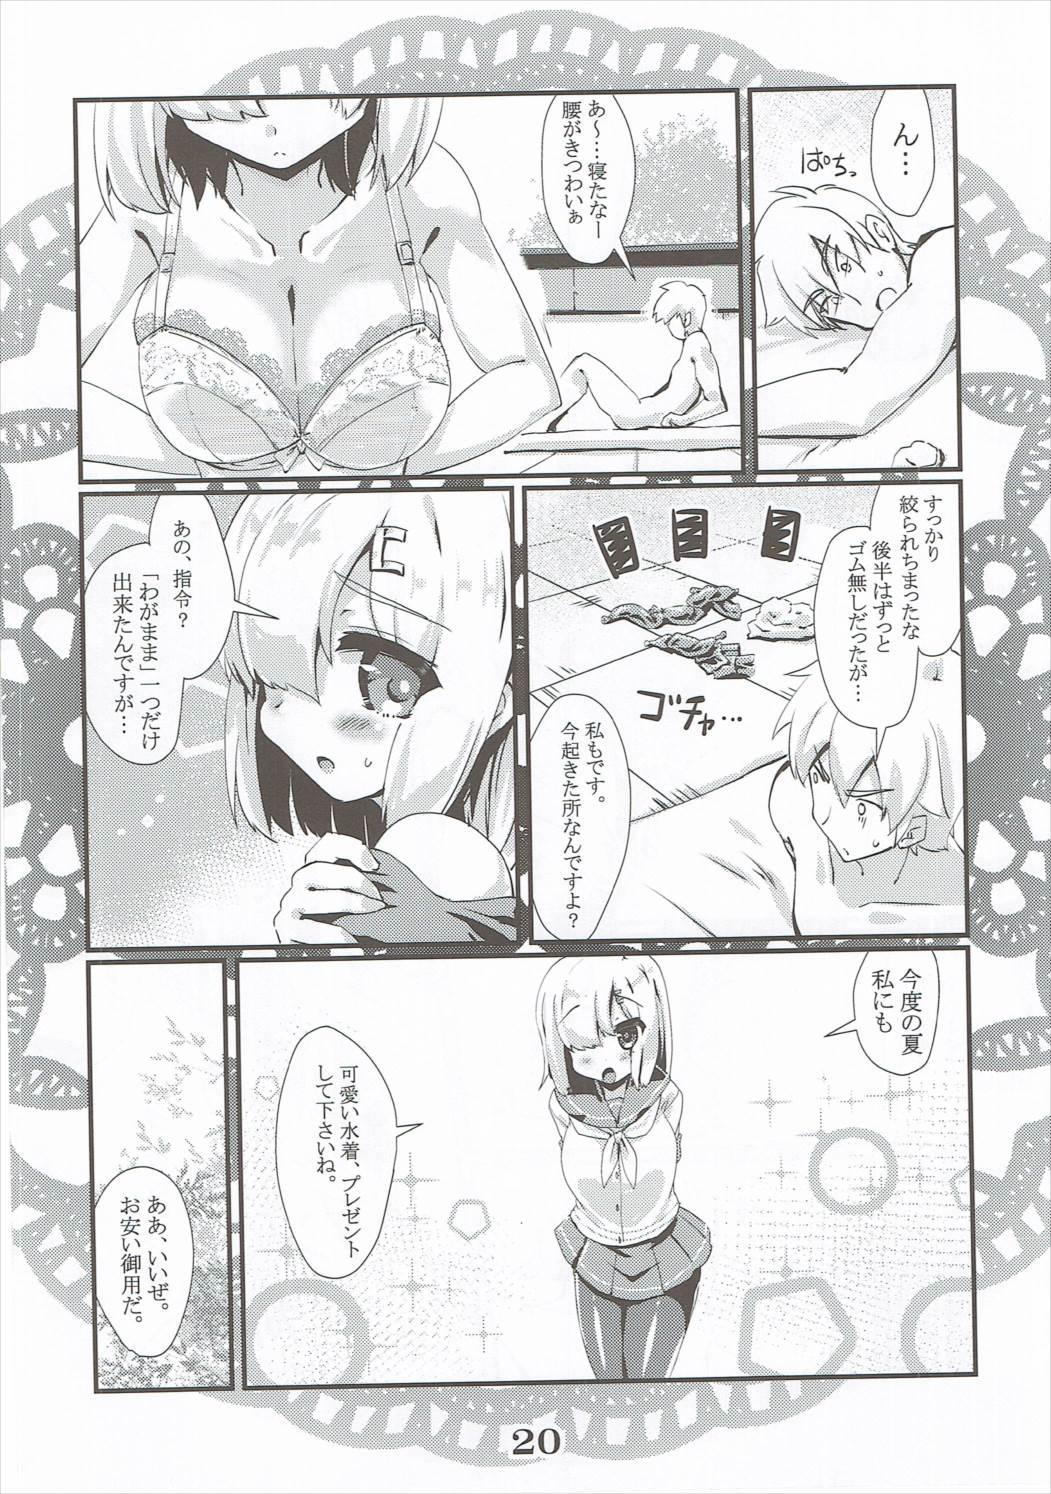 Rensou Harugatari 20 18